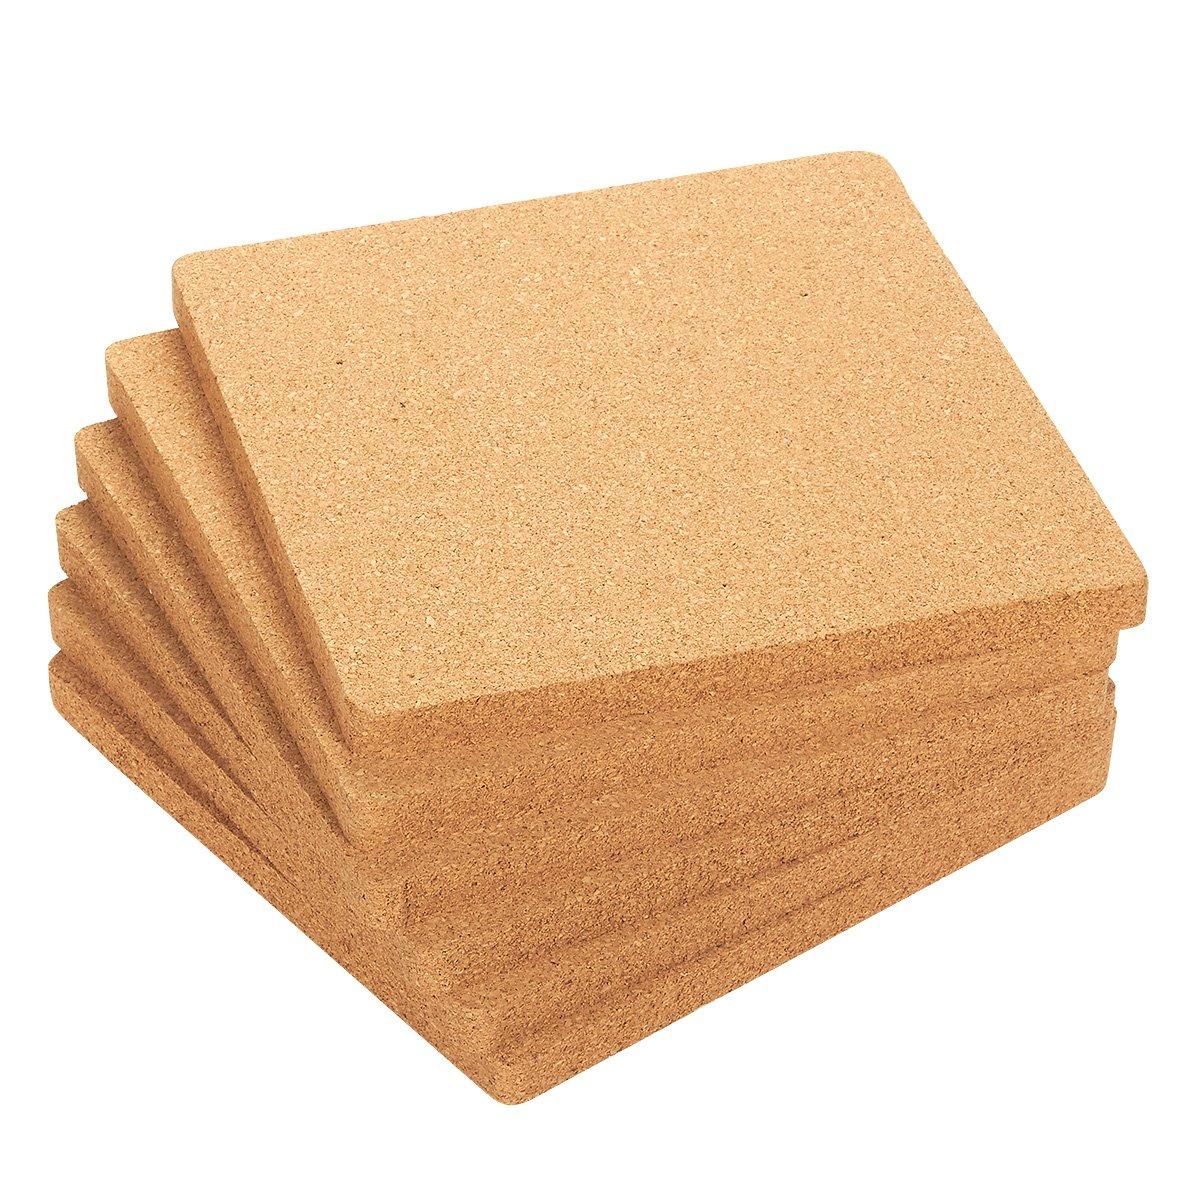 Juvale 6-Pack Cork Trivet Set - Square Corkboard Placemats Kitchen Hot Pads Hot Pots, Pans Kettles, 7 x 7 x 0.5 inches